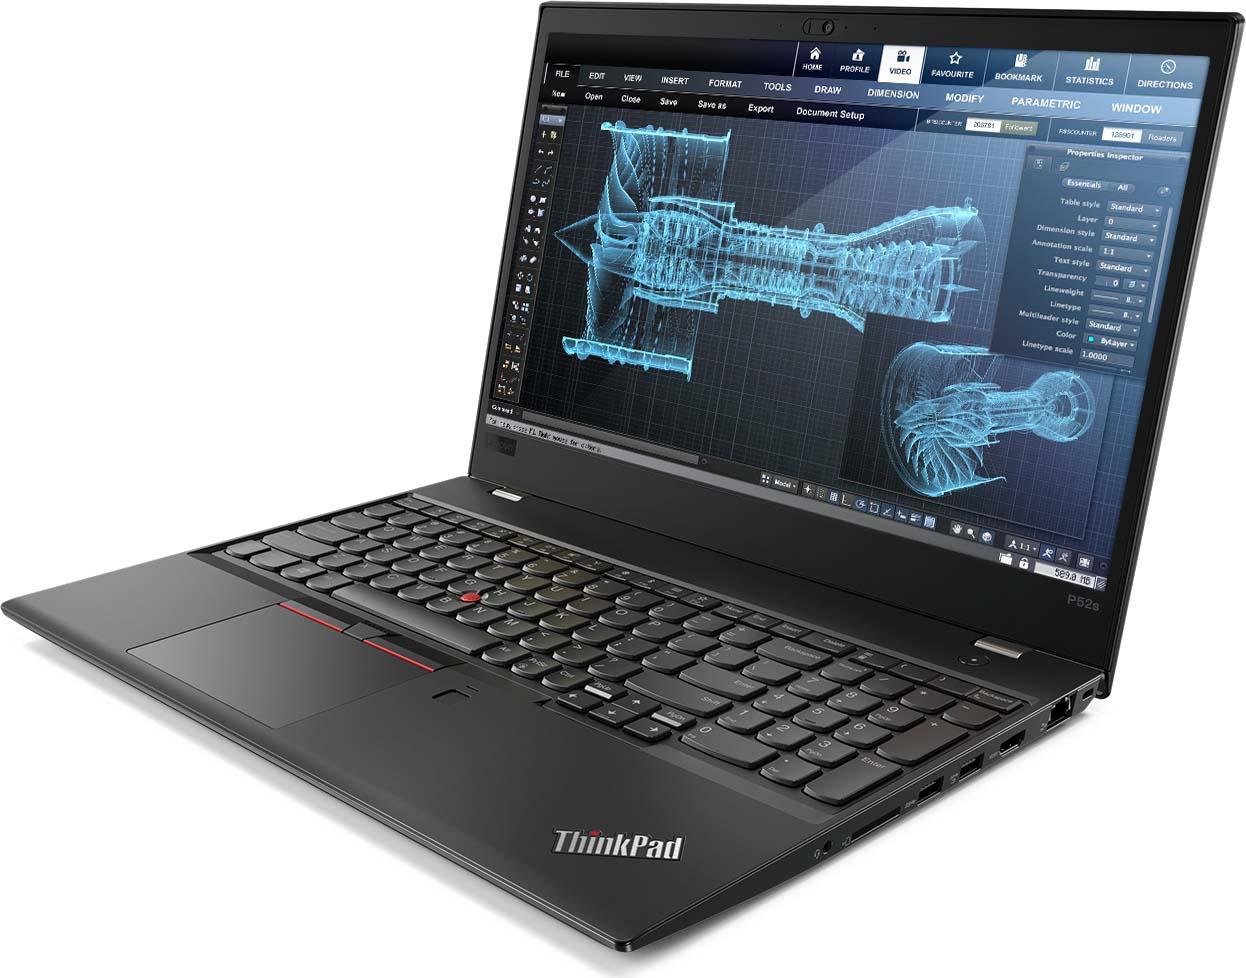 15.6 Ноутбук Lenovo ThinkPad P52s 20LB0008RT, черный lenovo thinkpad p52s 20lb000qrt черный